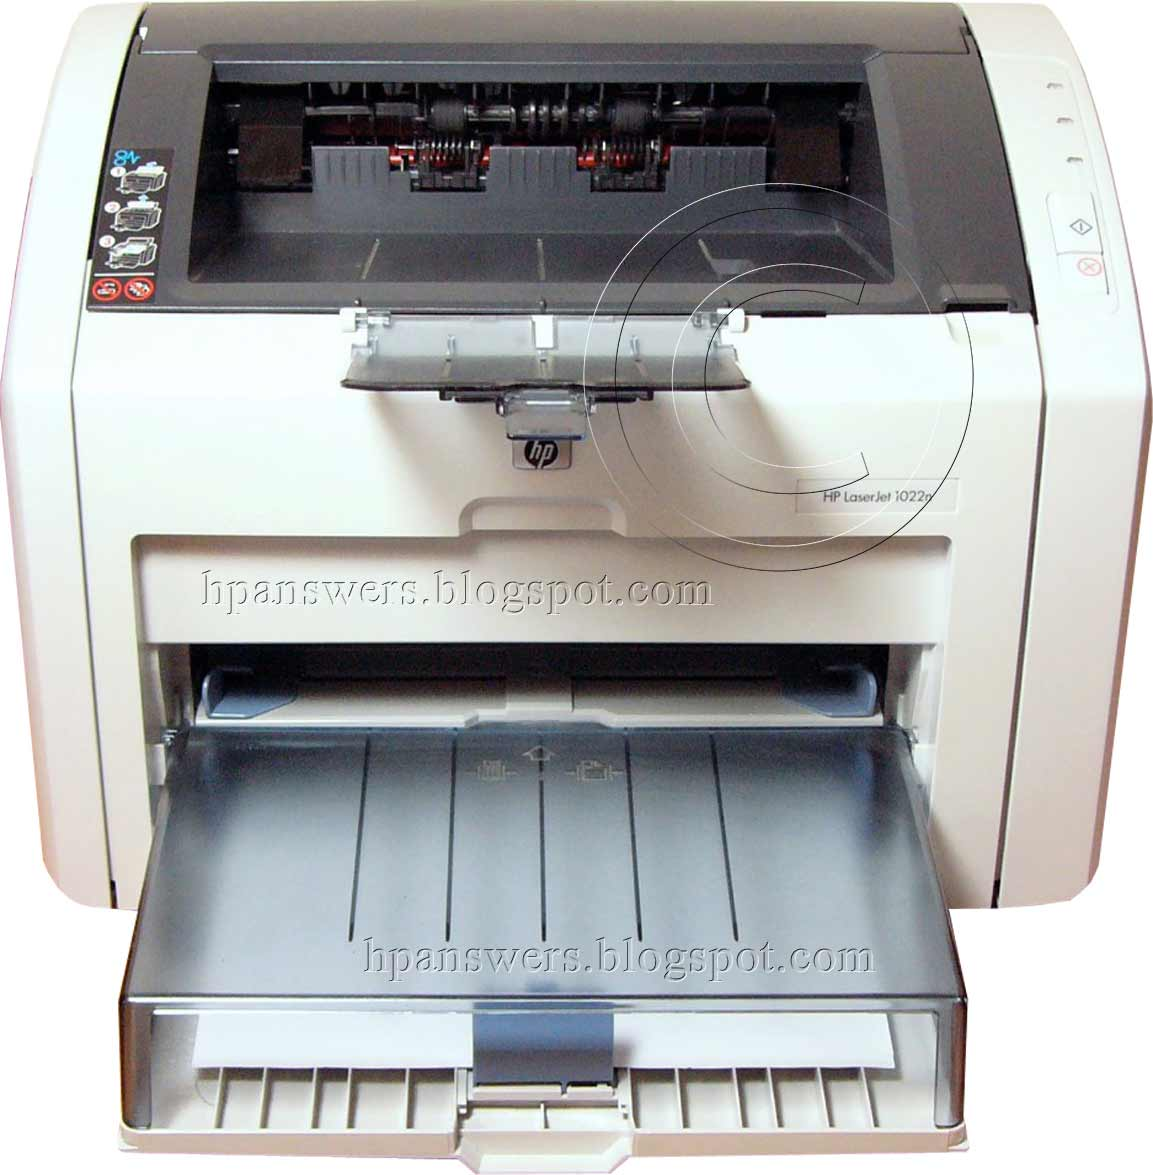 programa instalao impressora hp laserjet 1022